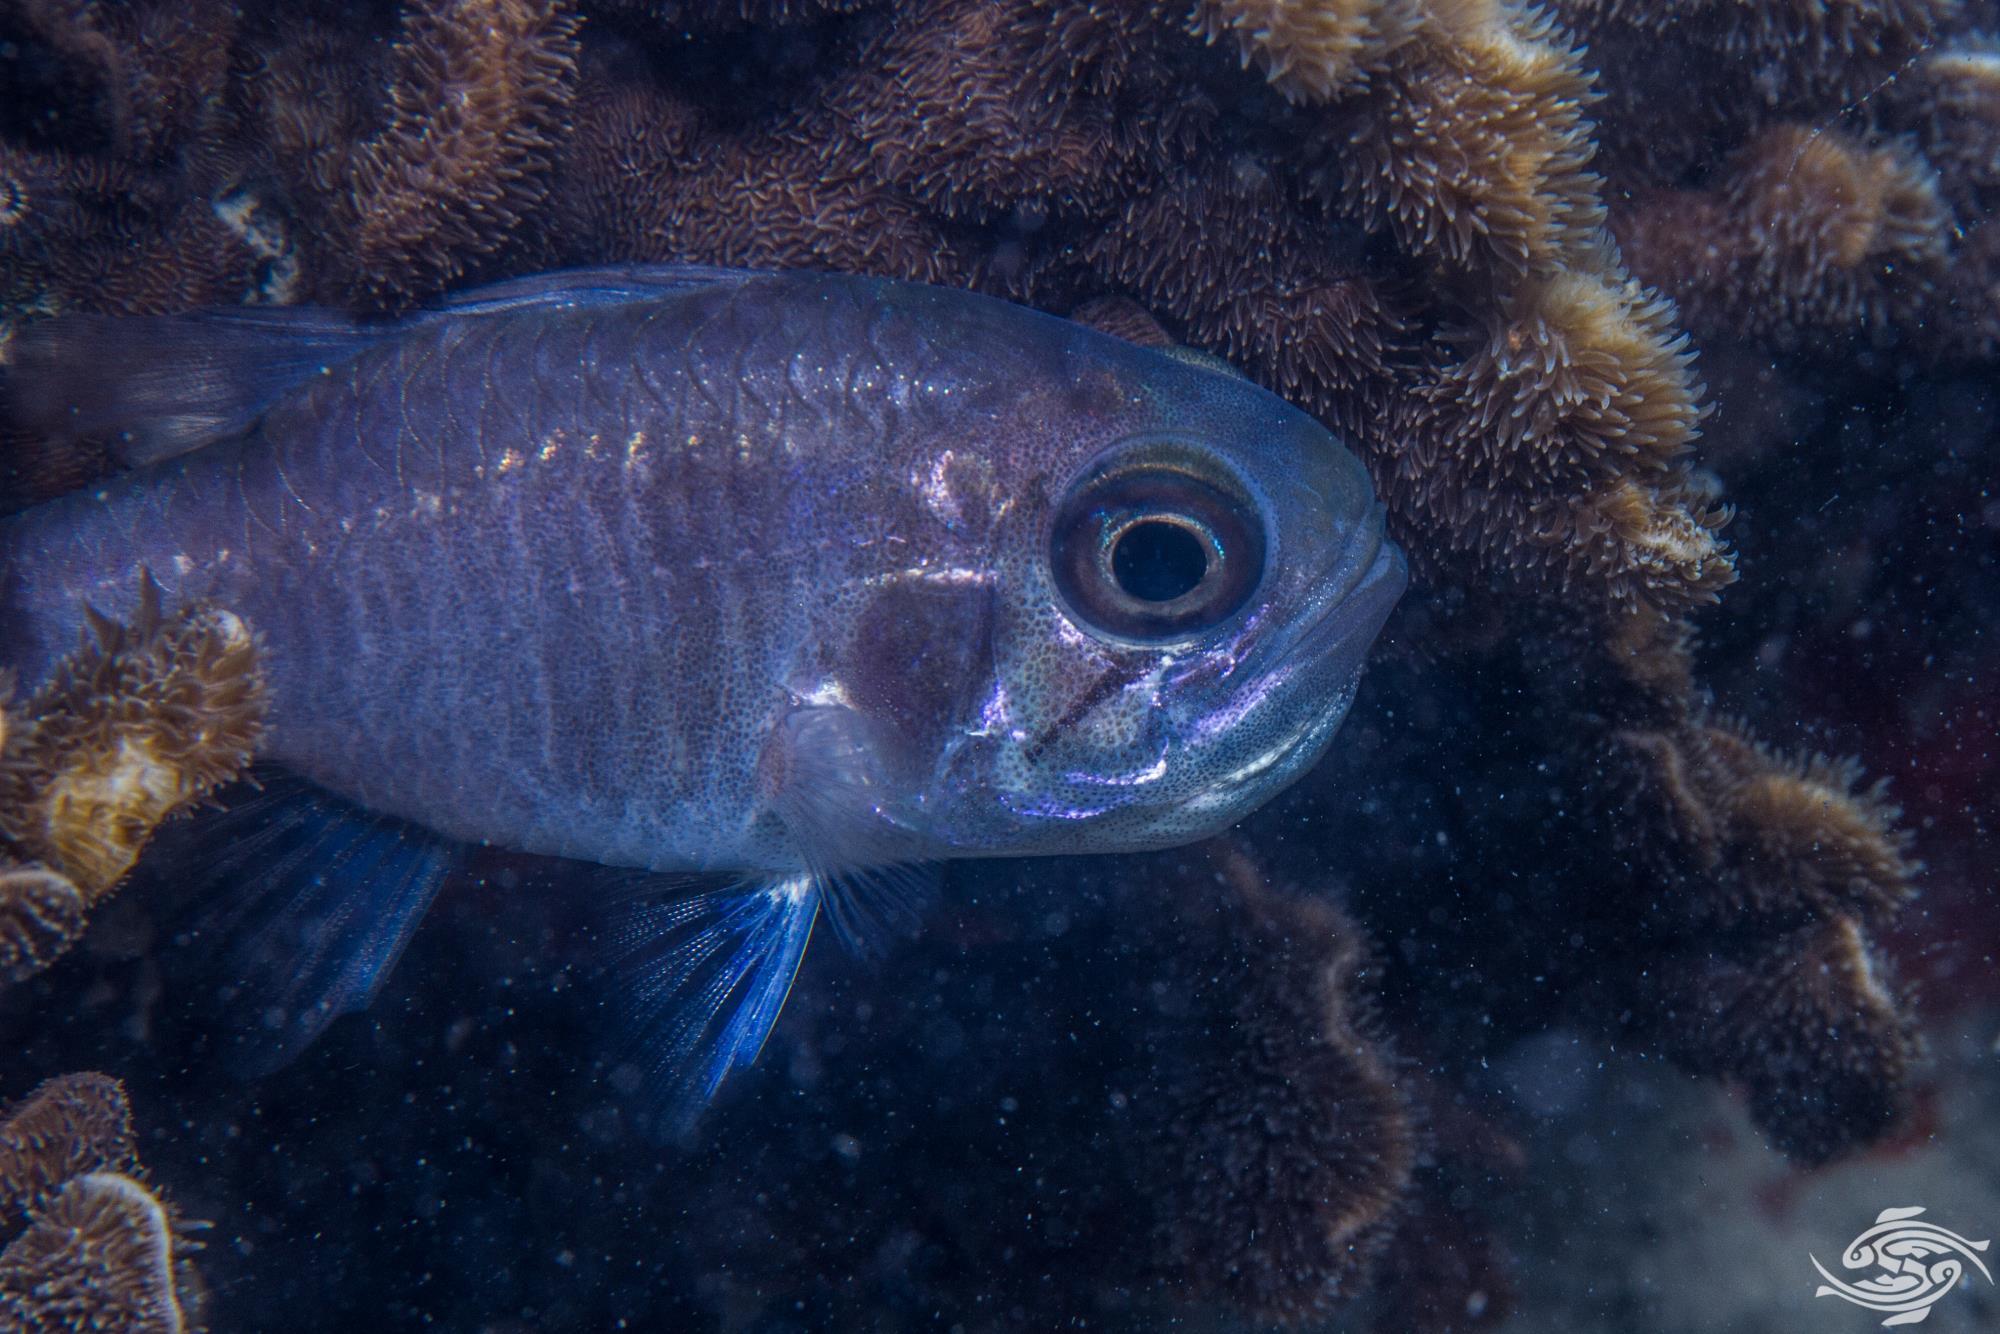 Ghost Cardinalfish Nectamia fusca